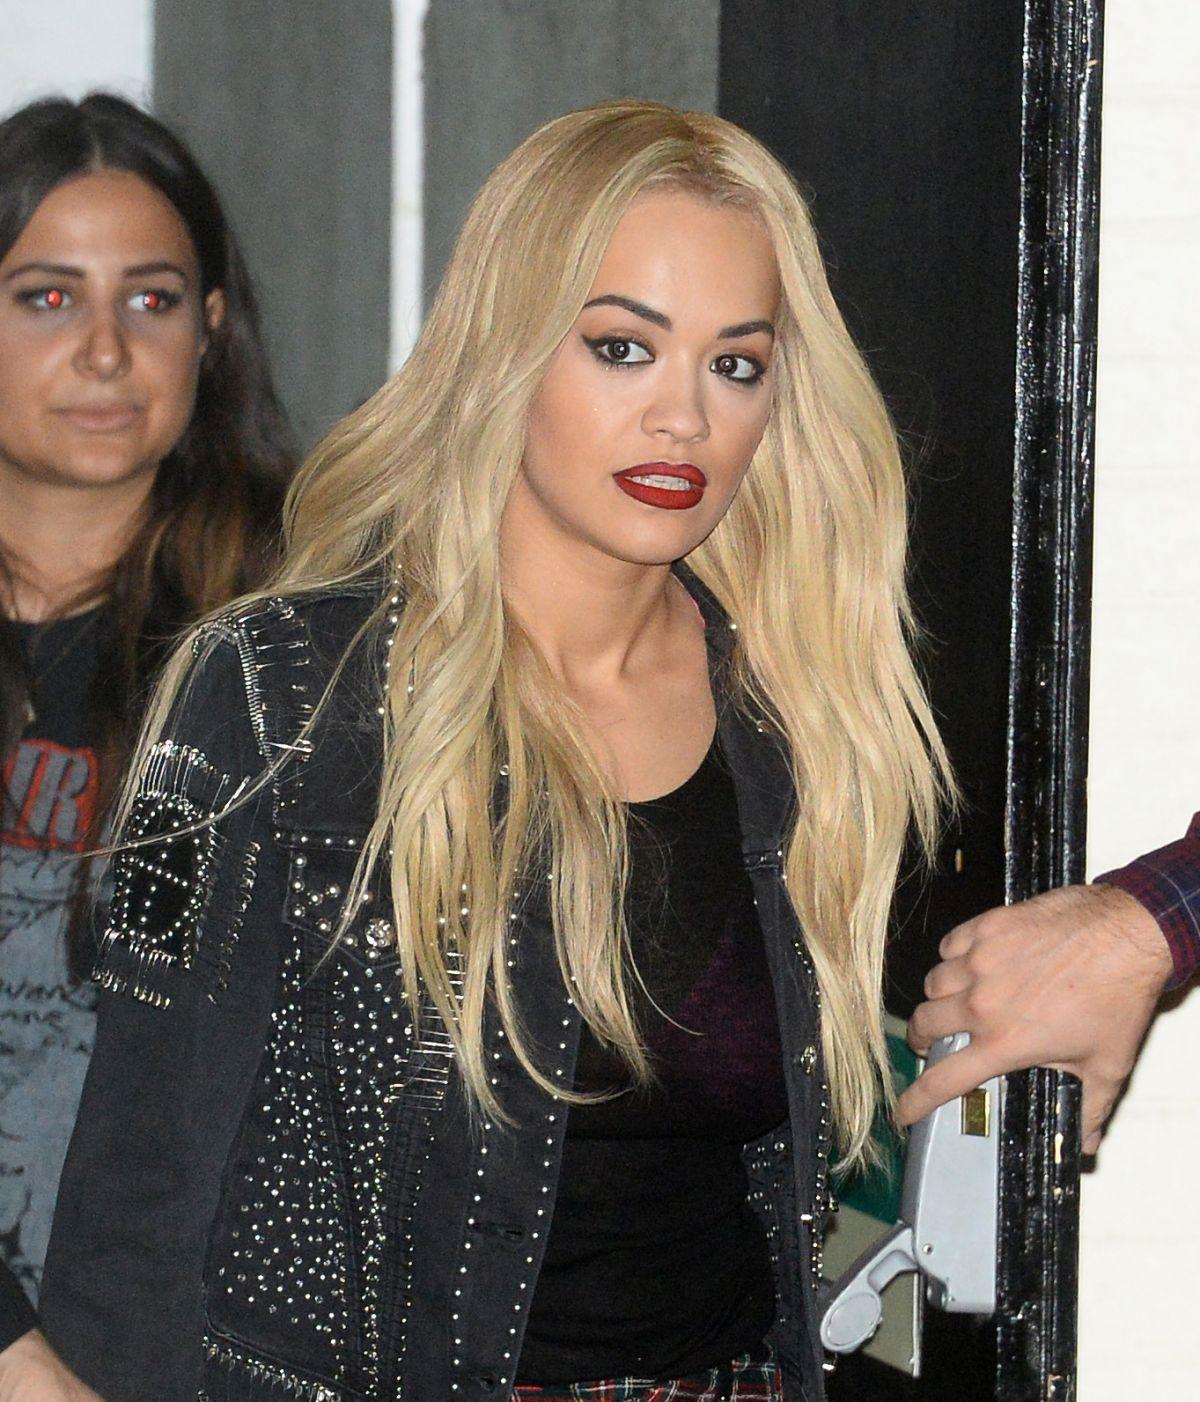 RITA ORA Leaves The X Factor Studios in London 11/29/2015